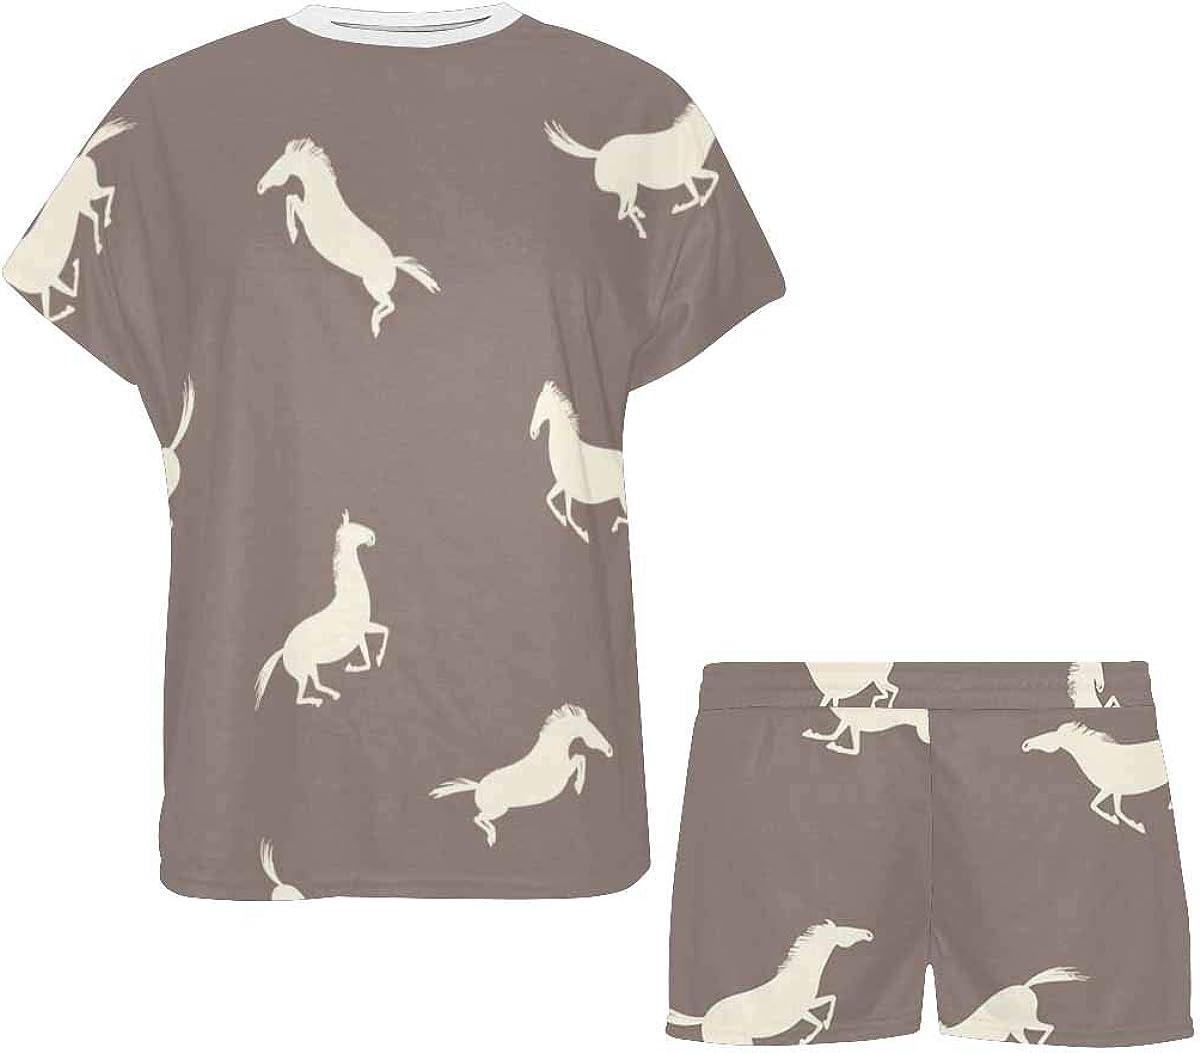 InterestPrint Pattern with Active Horses Women's Breathable 2 Piece Shorts Pajama Sleepwear Set